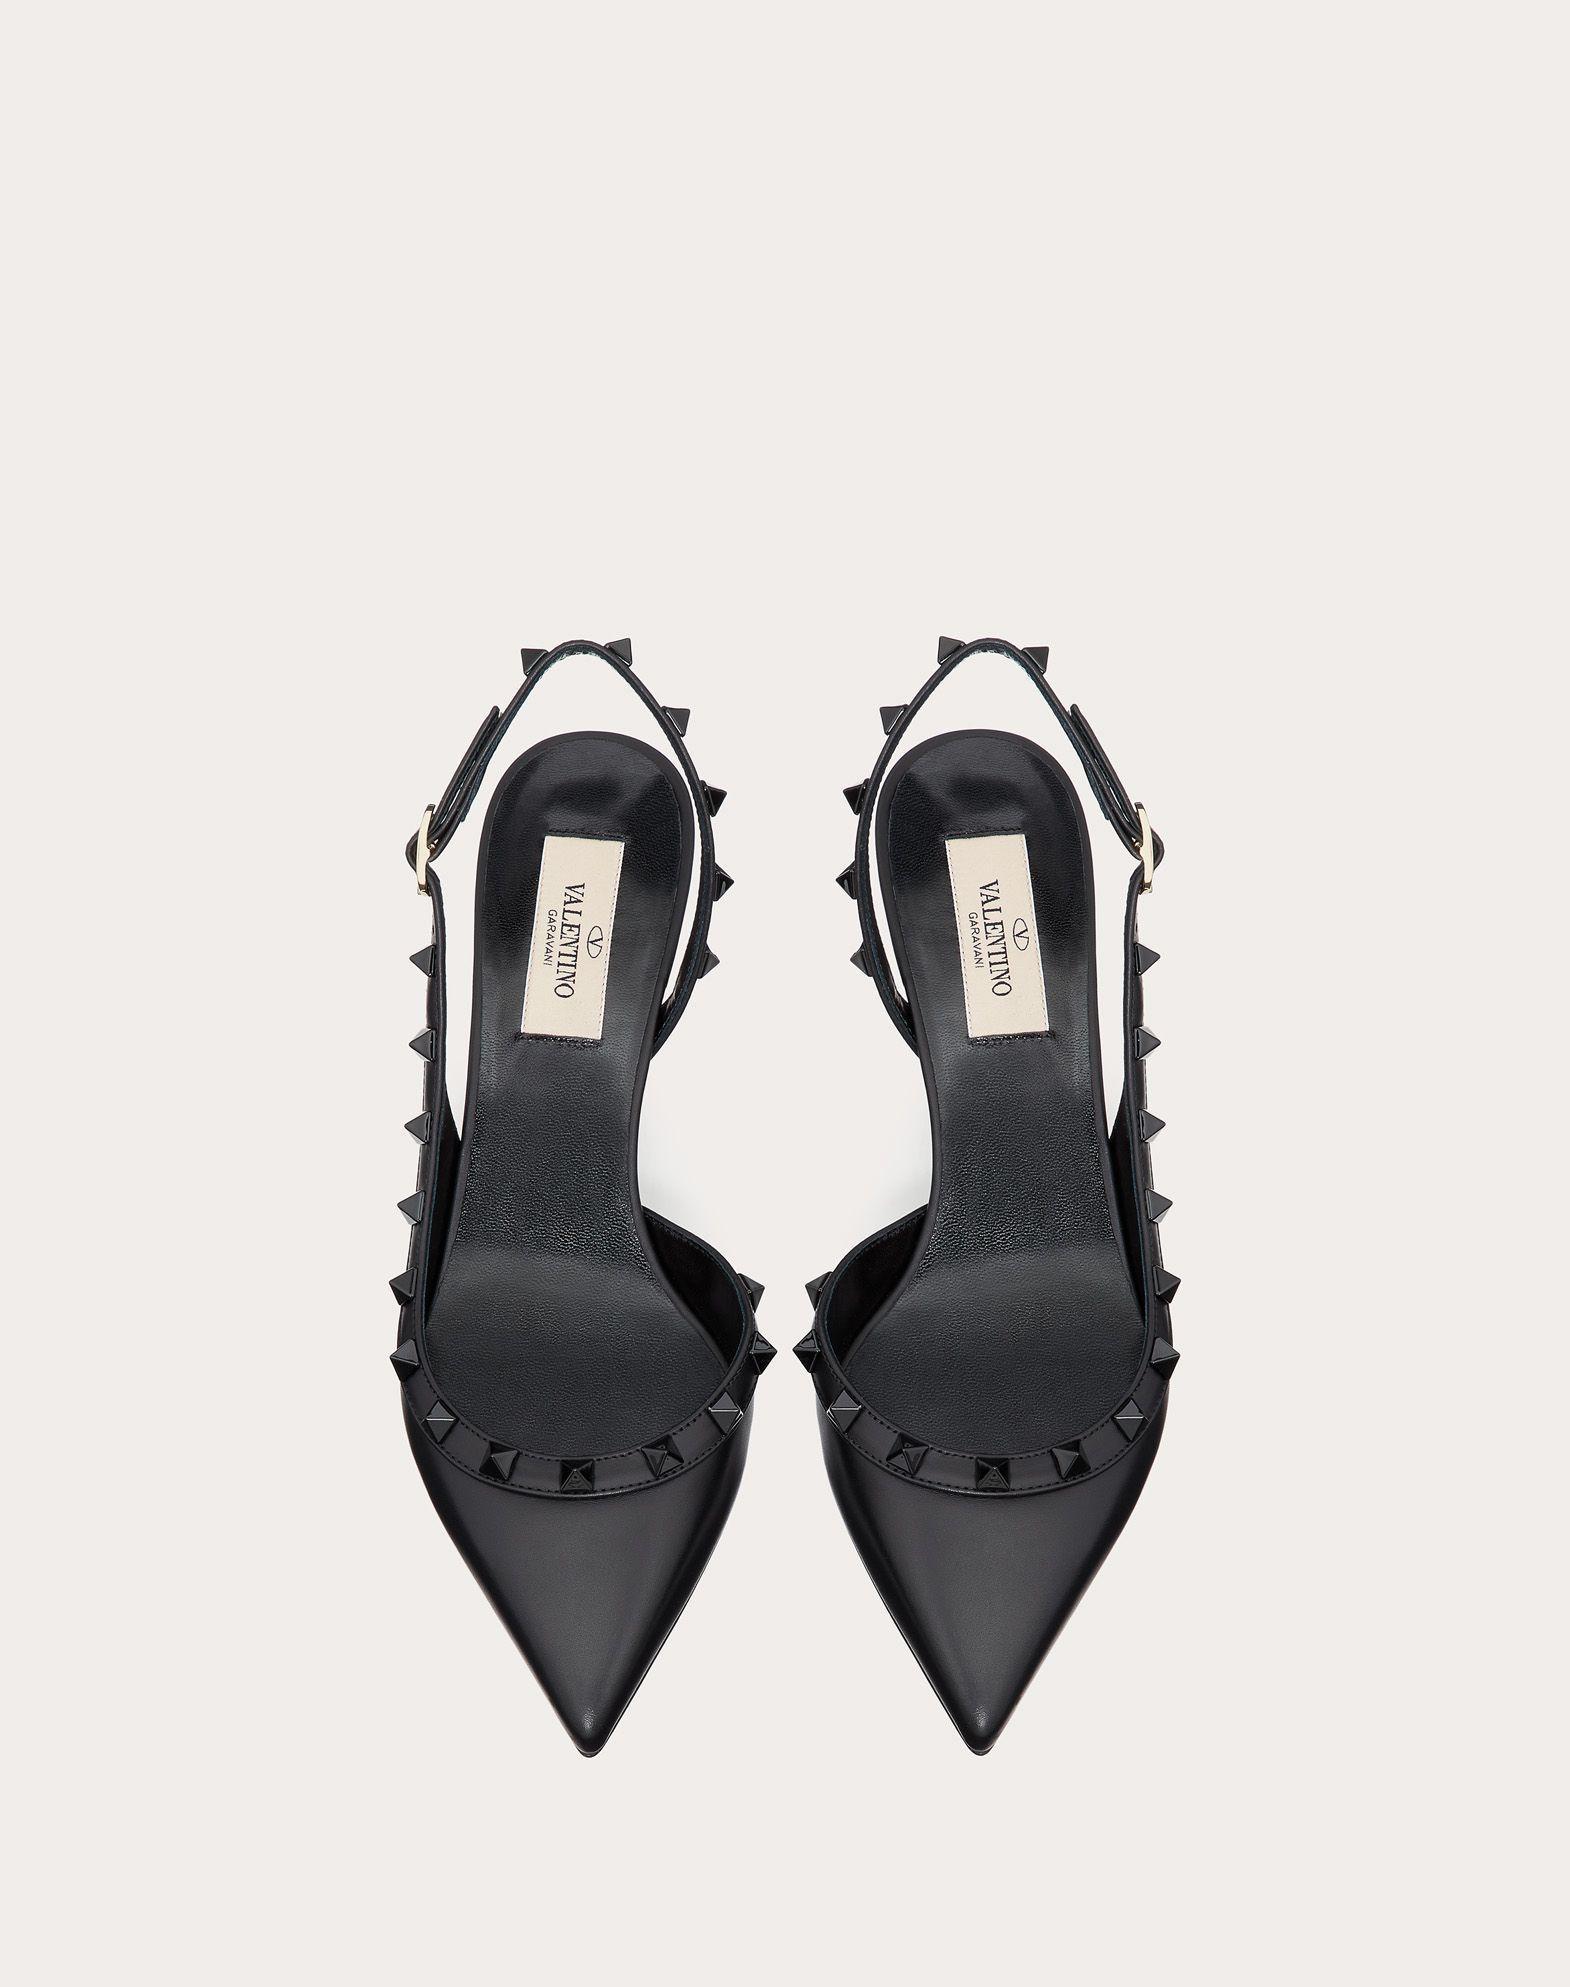 Valentino Rockstud Calfskin Leather